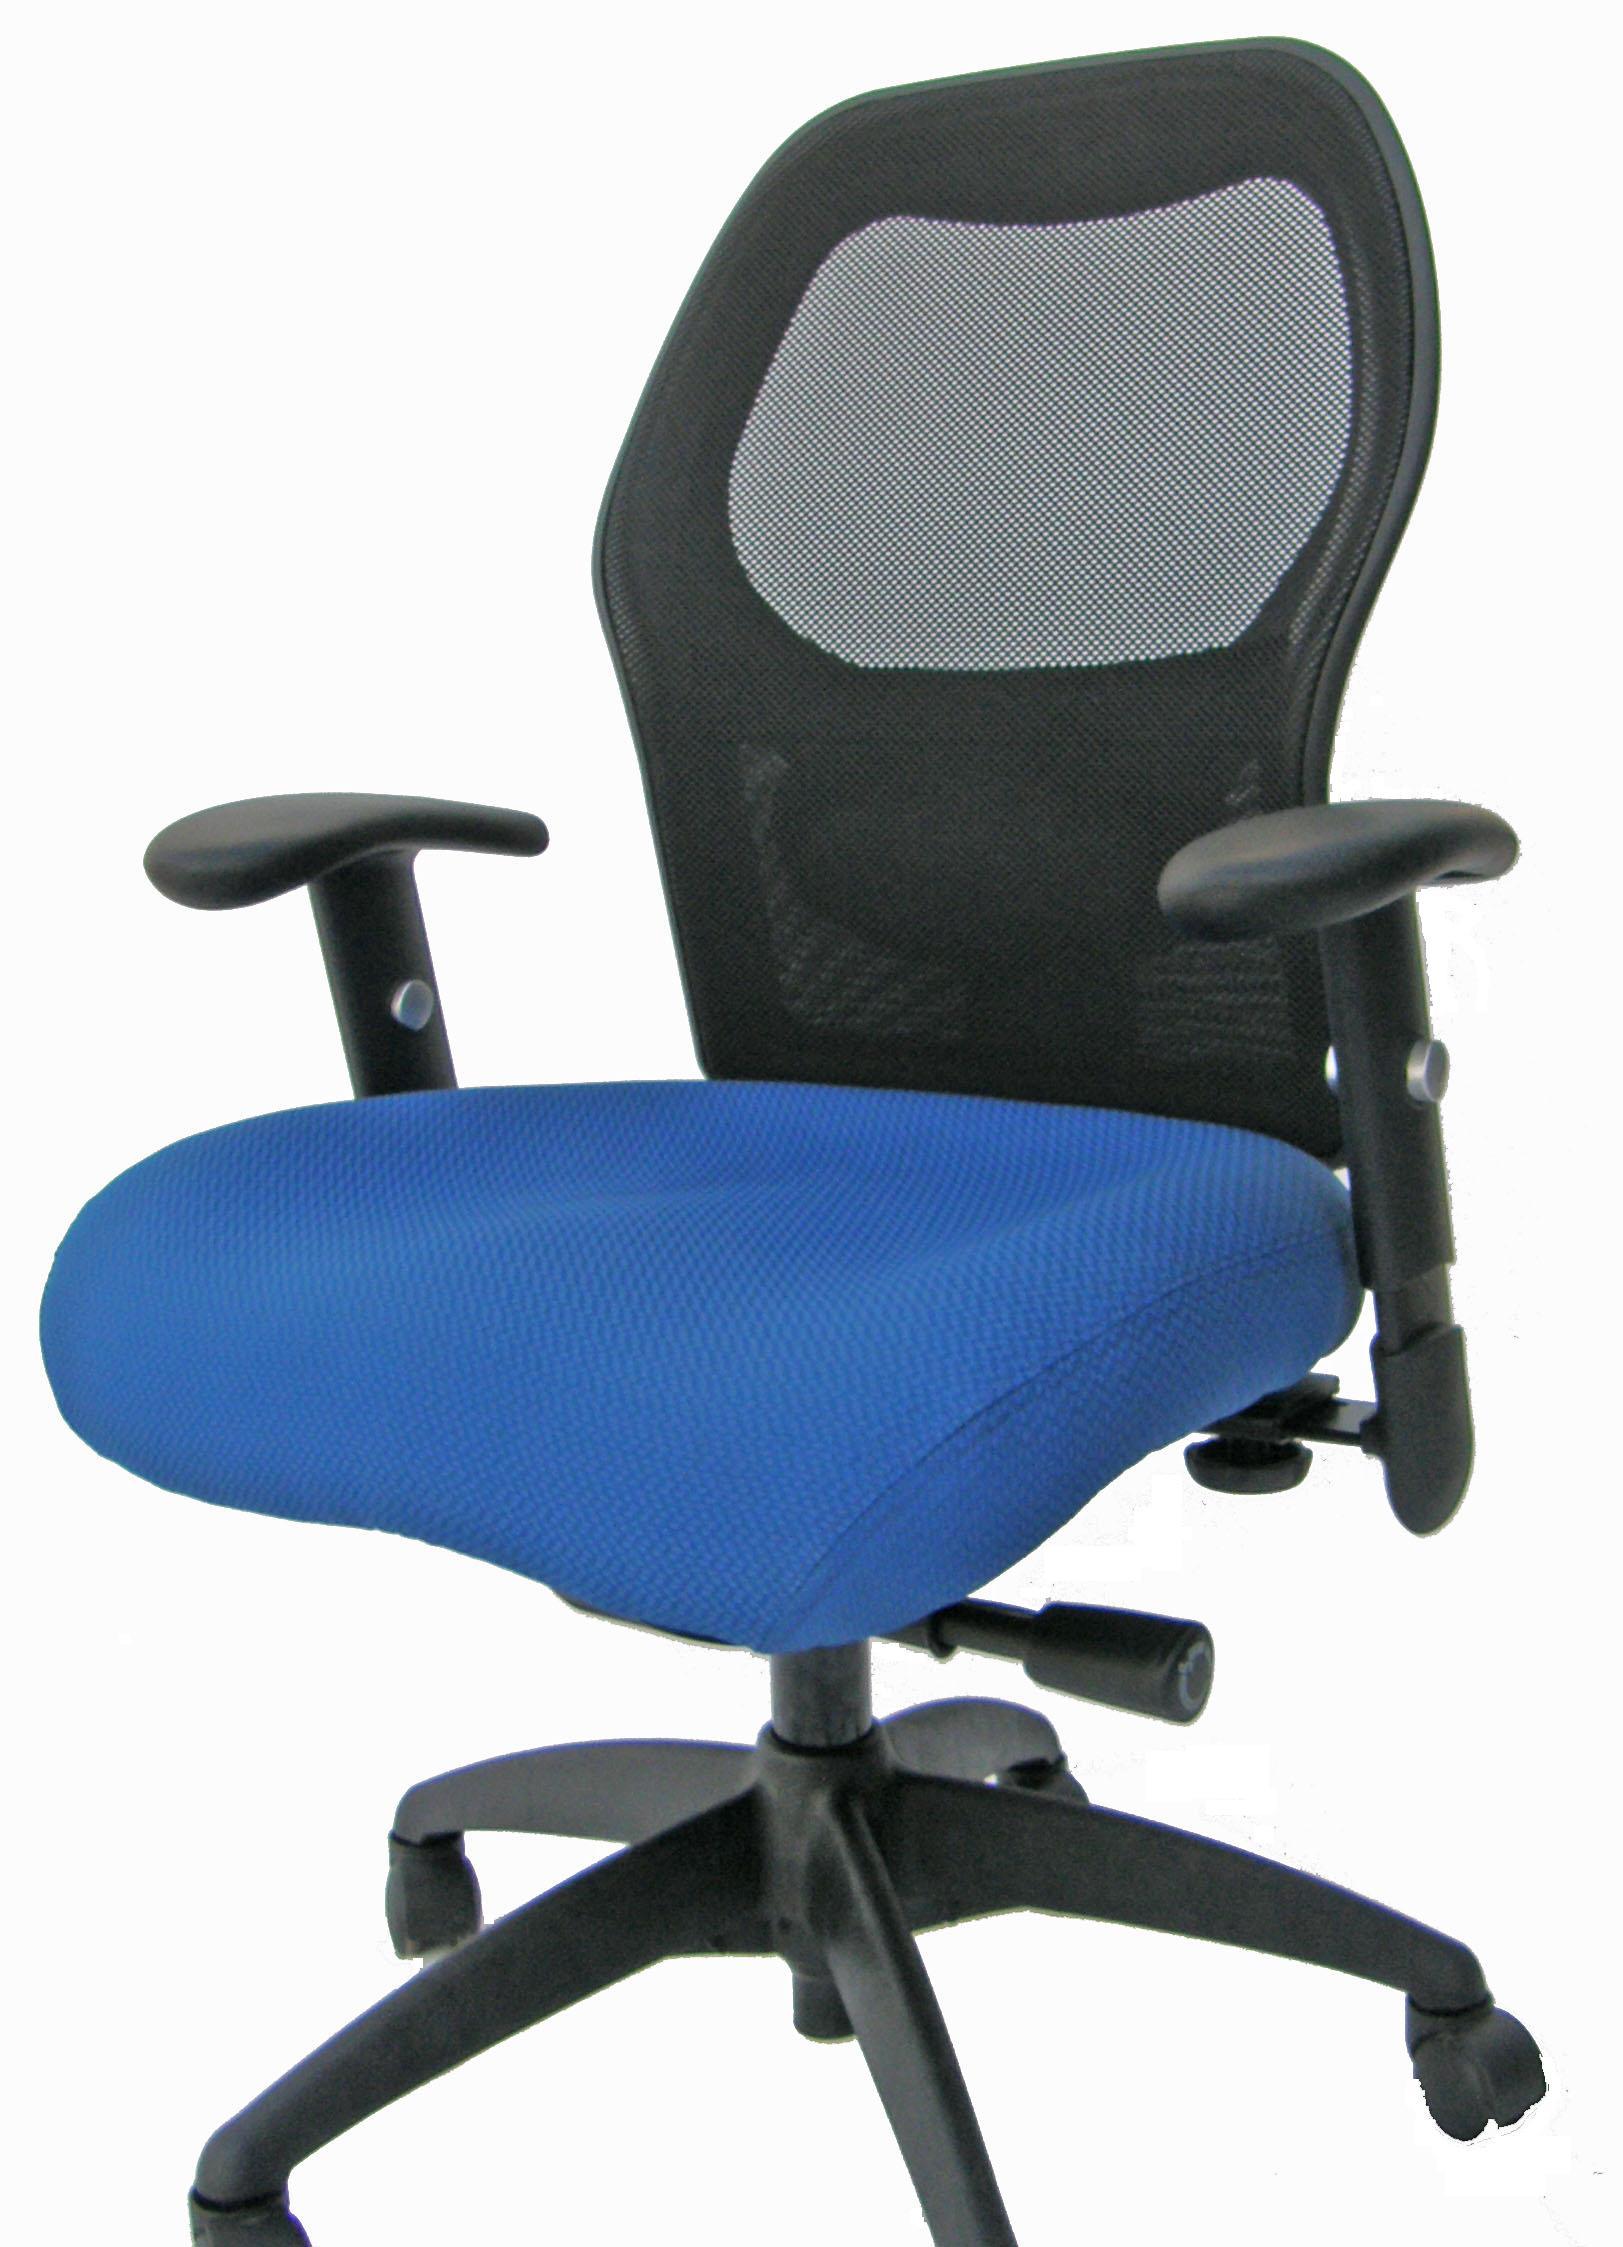 Best Mesh Ergonomic Chair - Champion SeatingChampion Seating 411f3135dc754